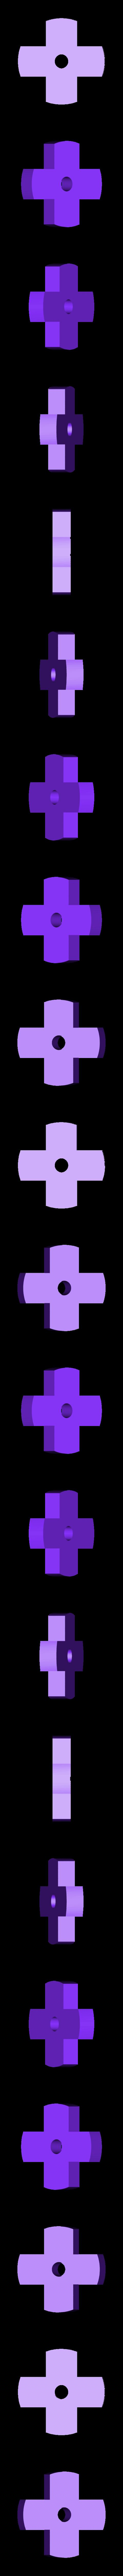 rondelle croix.STL Download free STL file door security • 3D printer object, robroy